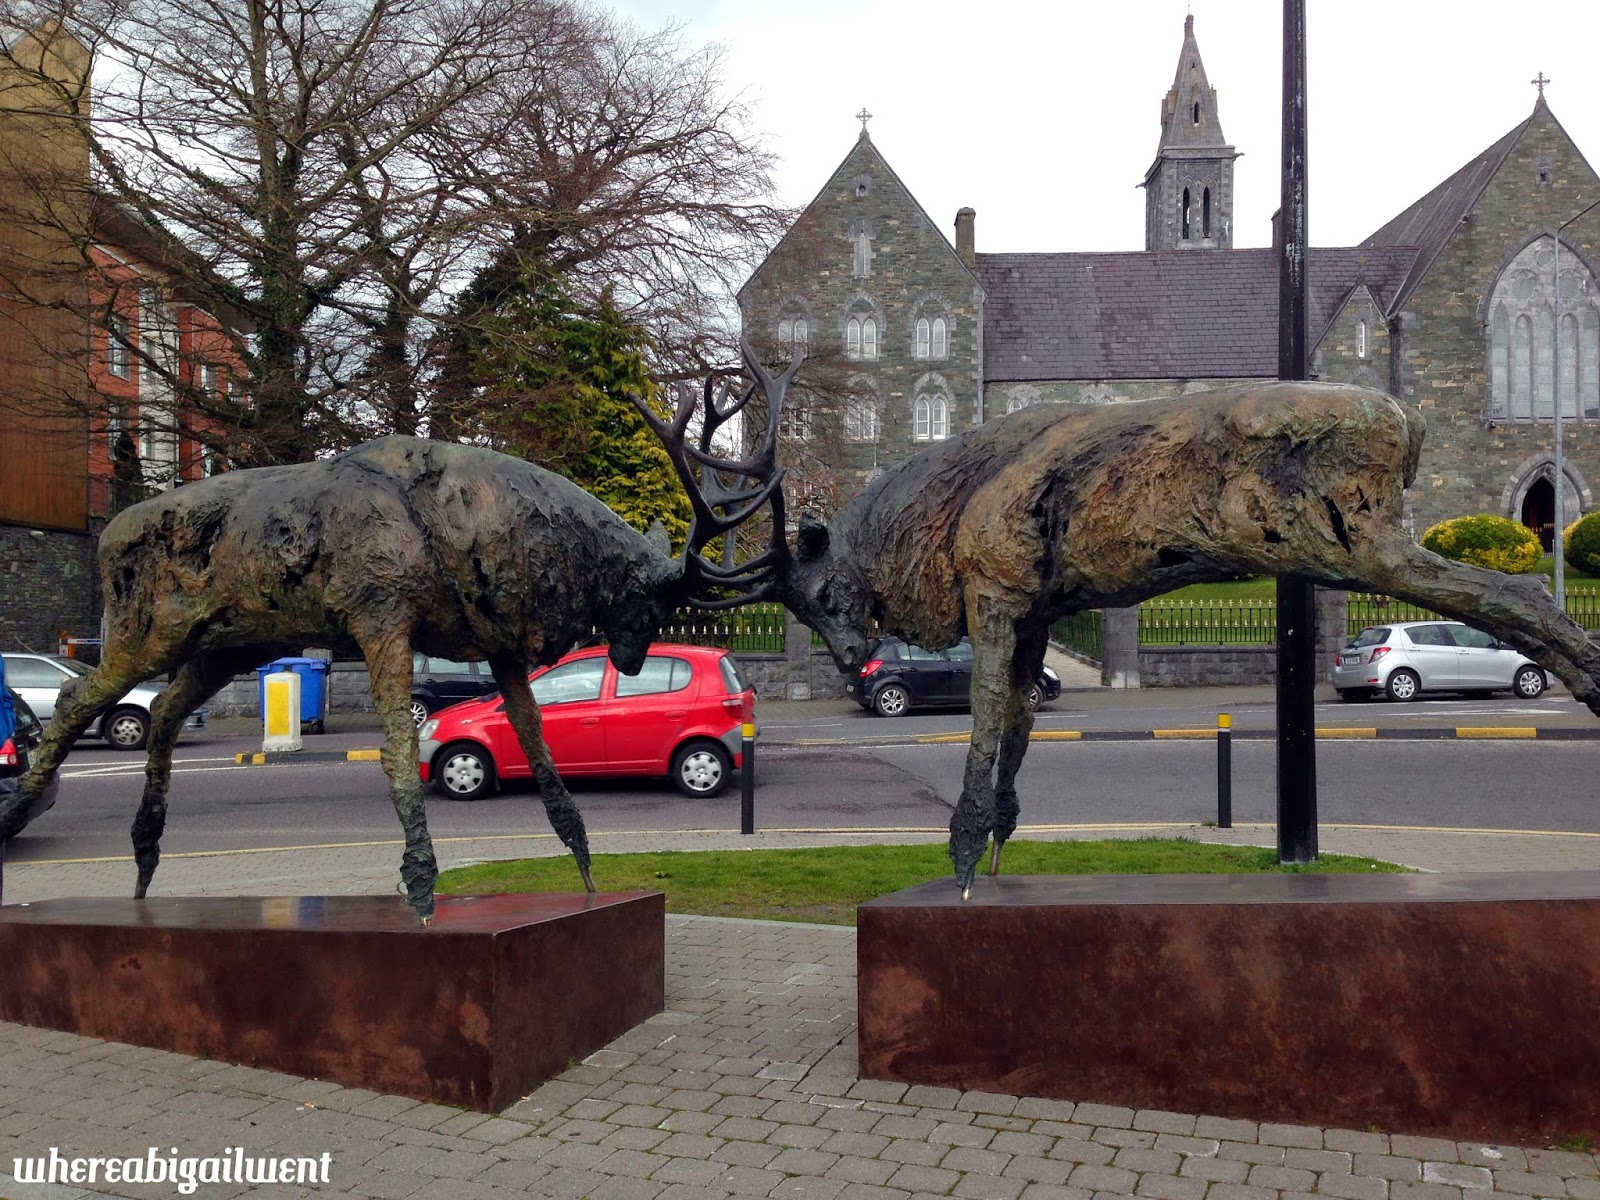 Stags fighting statue Killarney